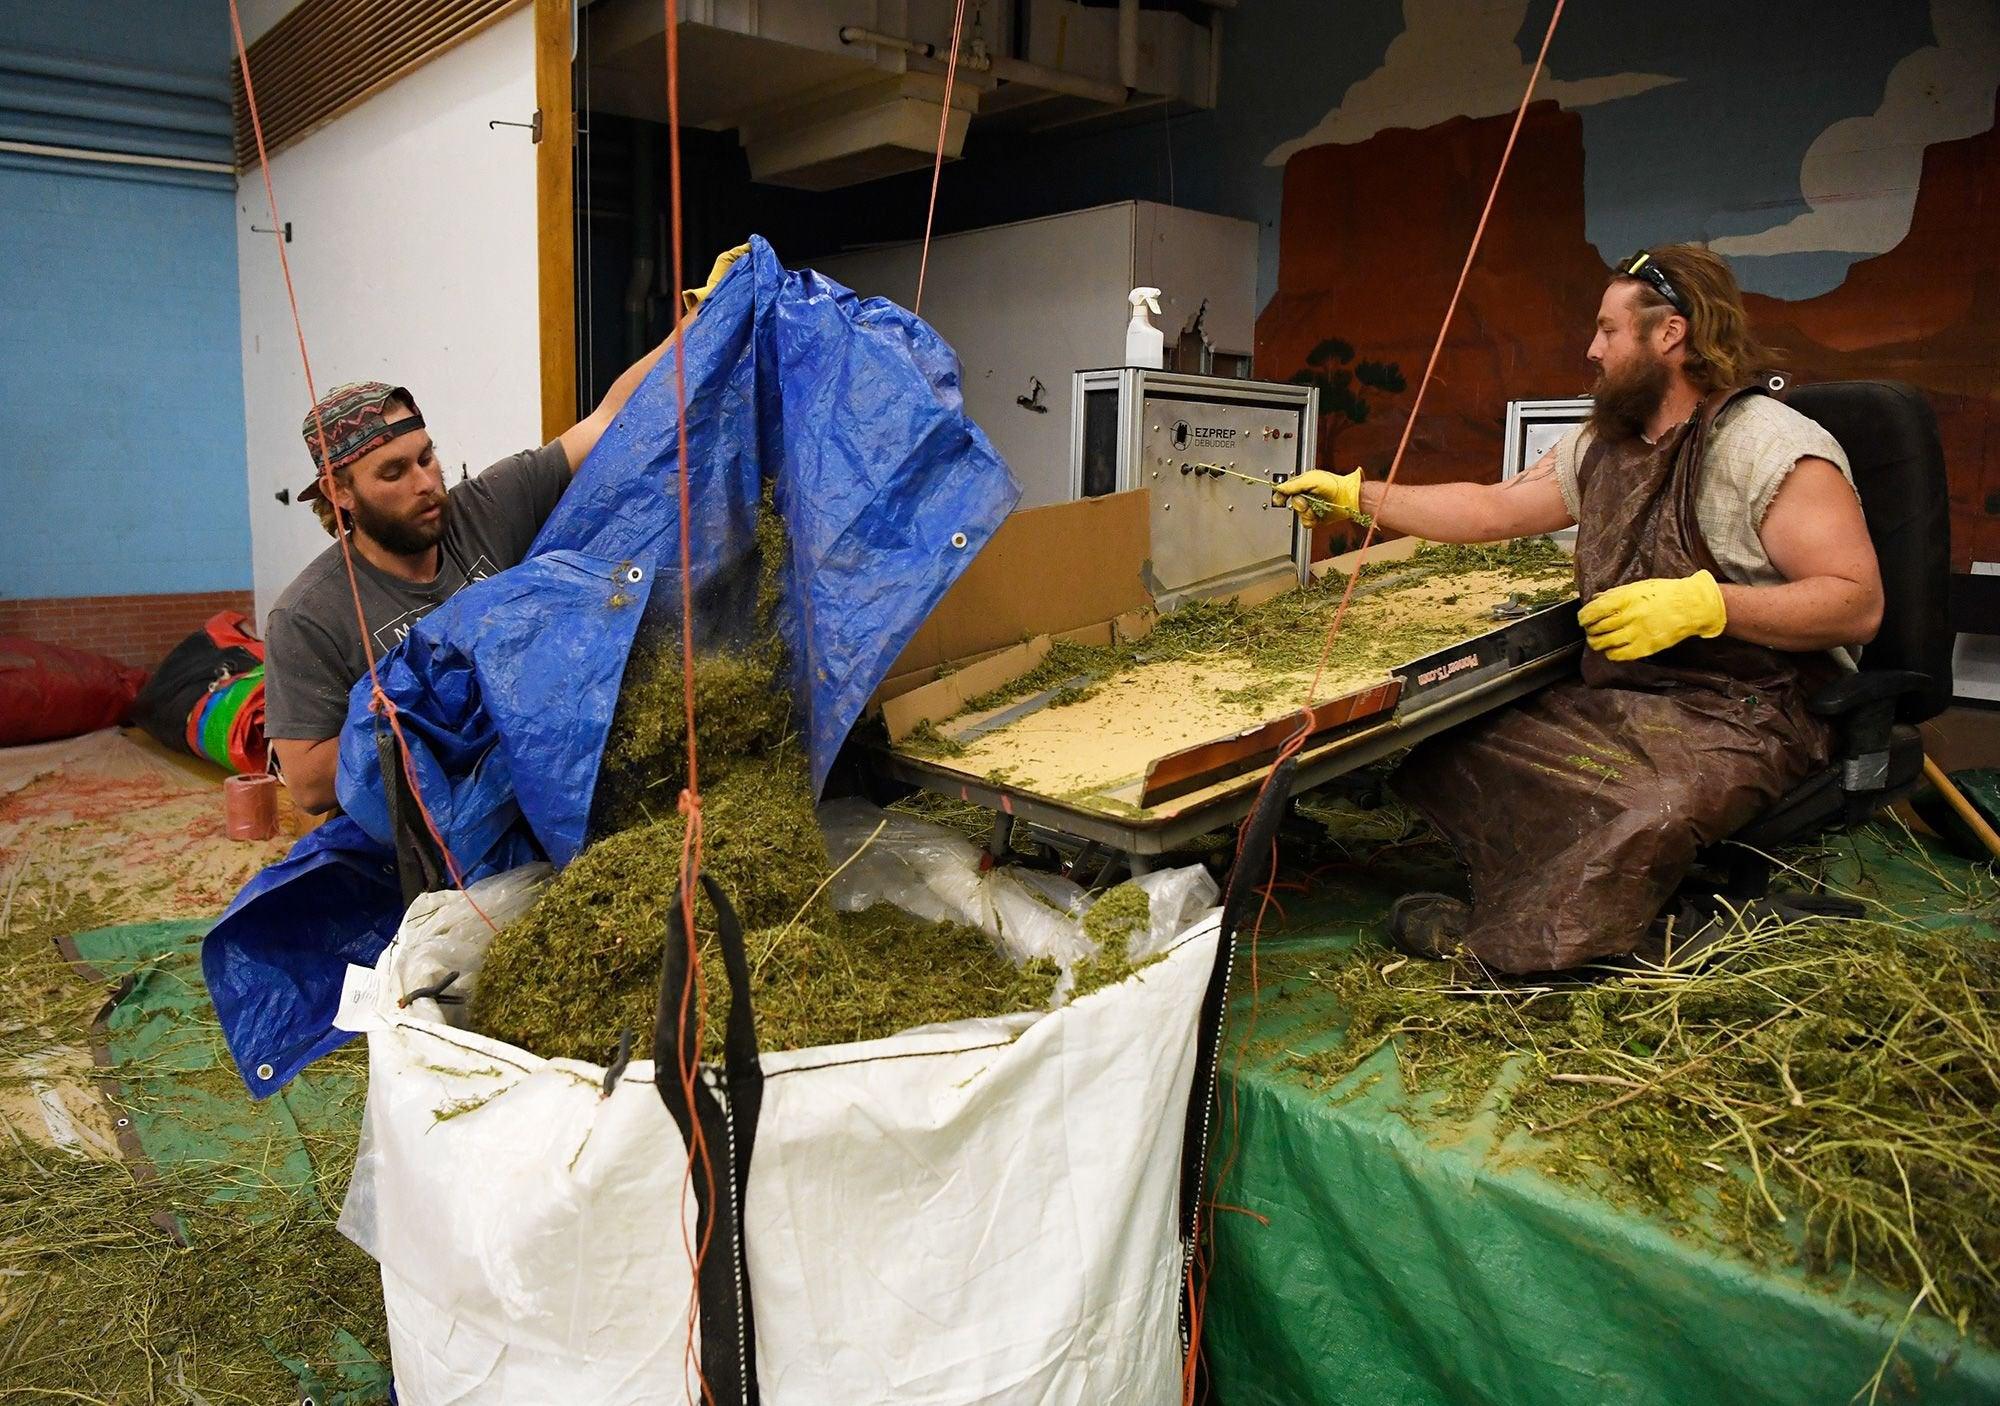 Colorado passes $1 billion in marijuana state revenue